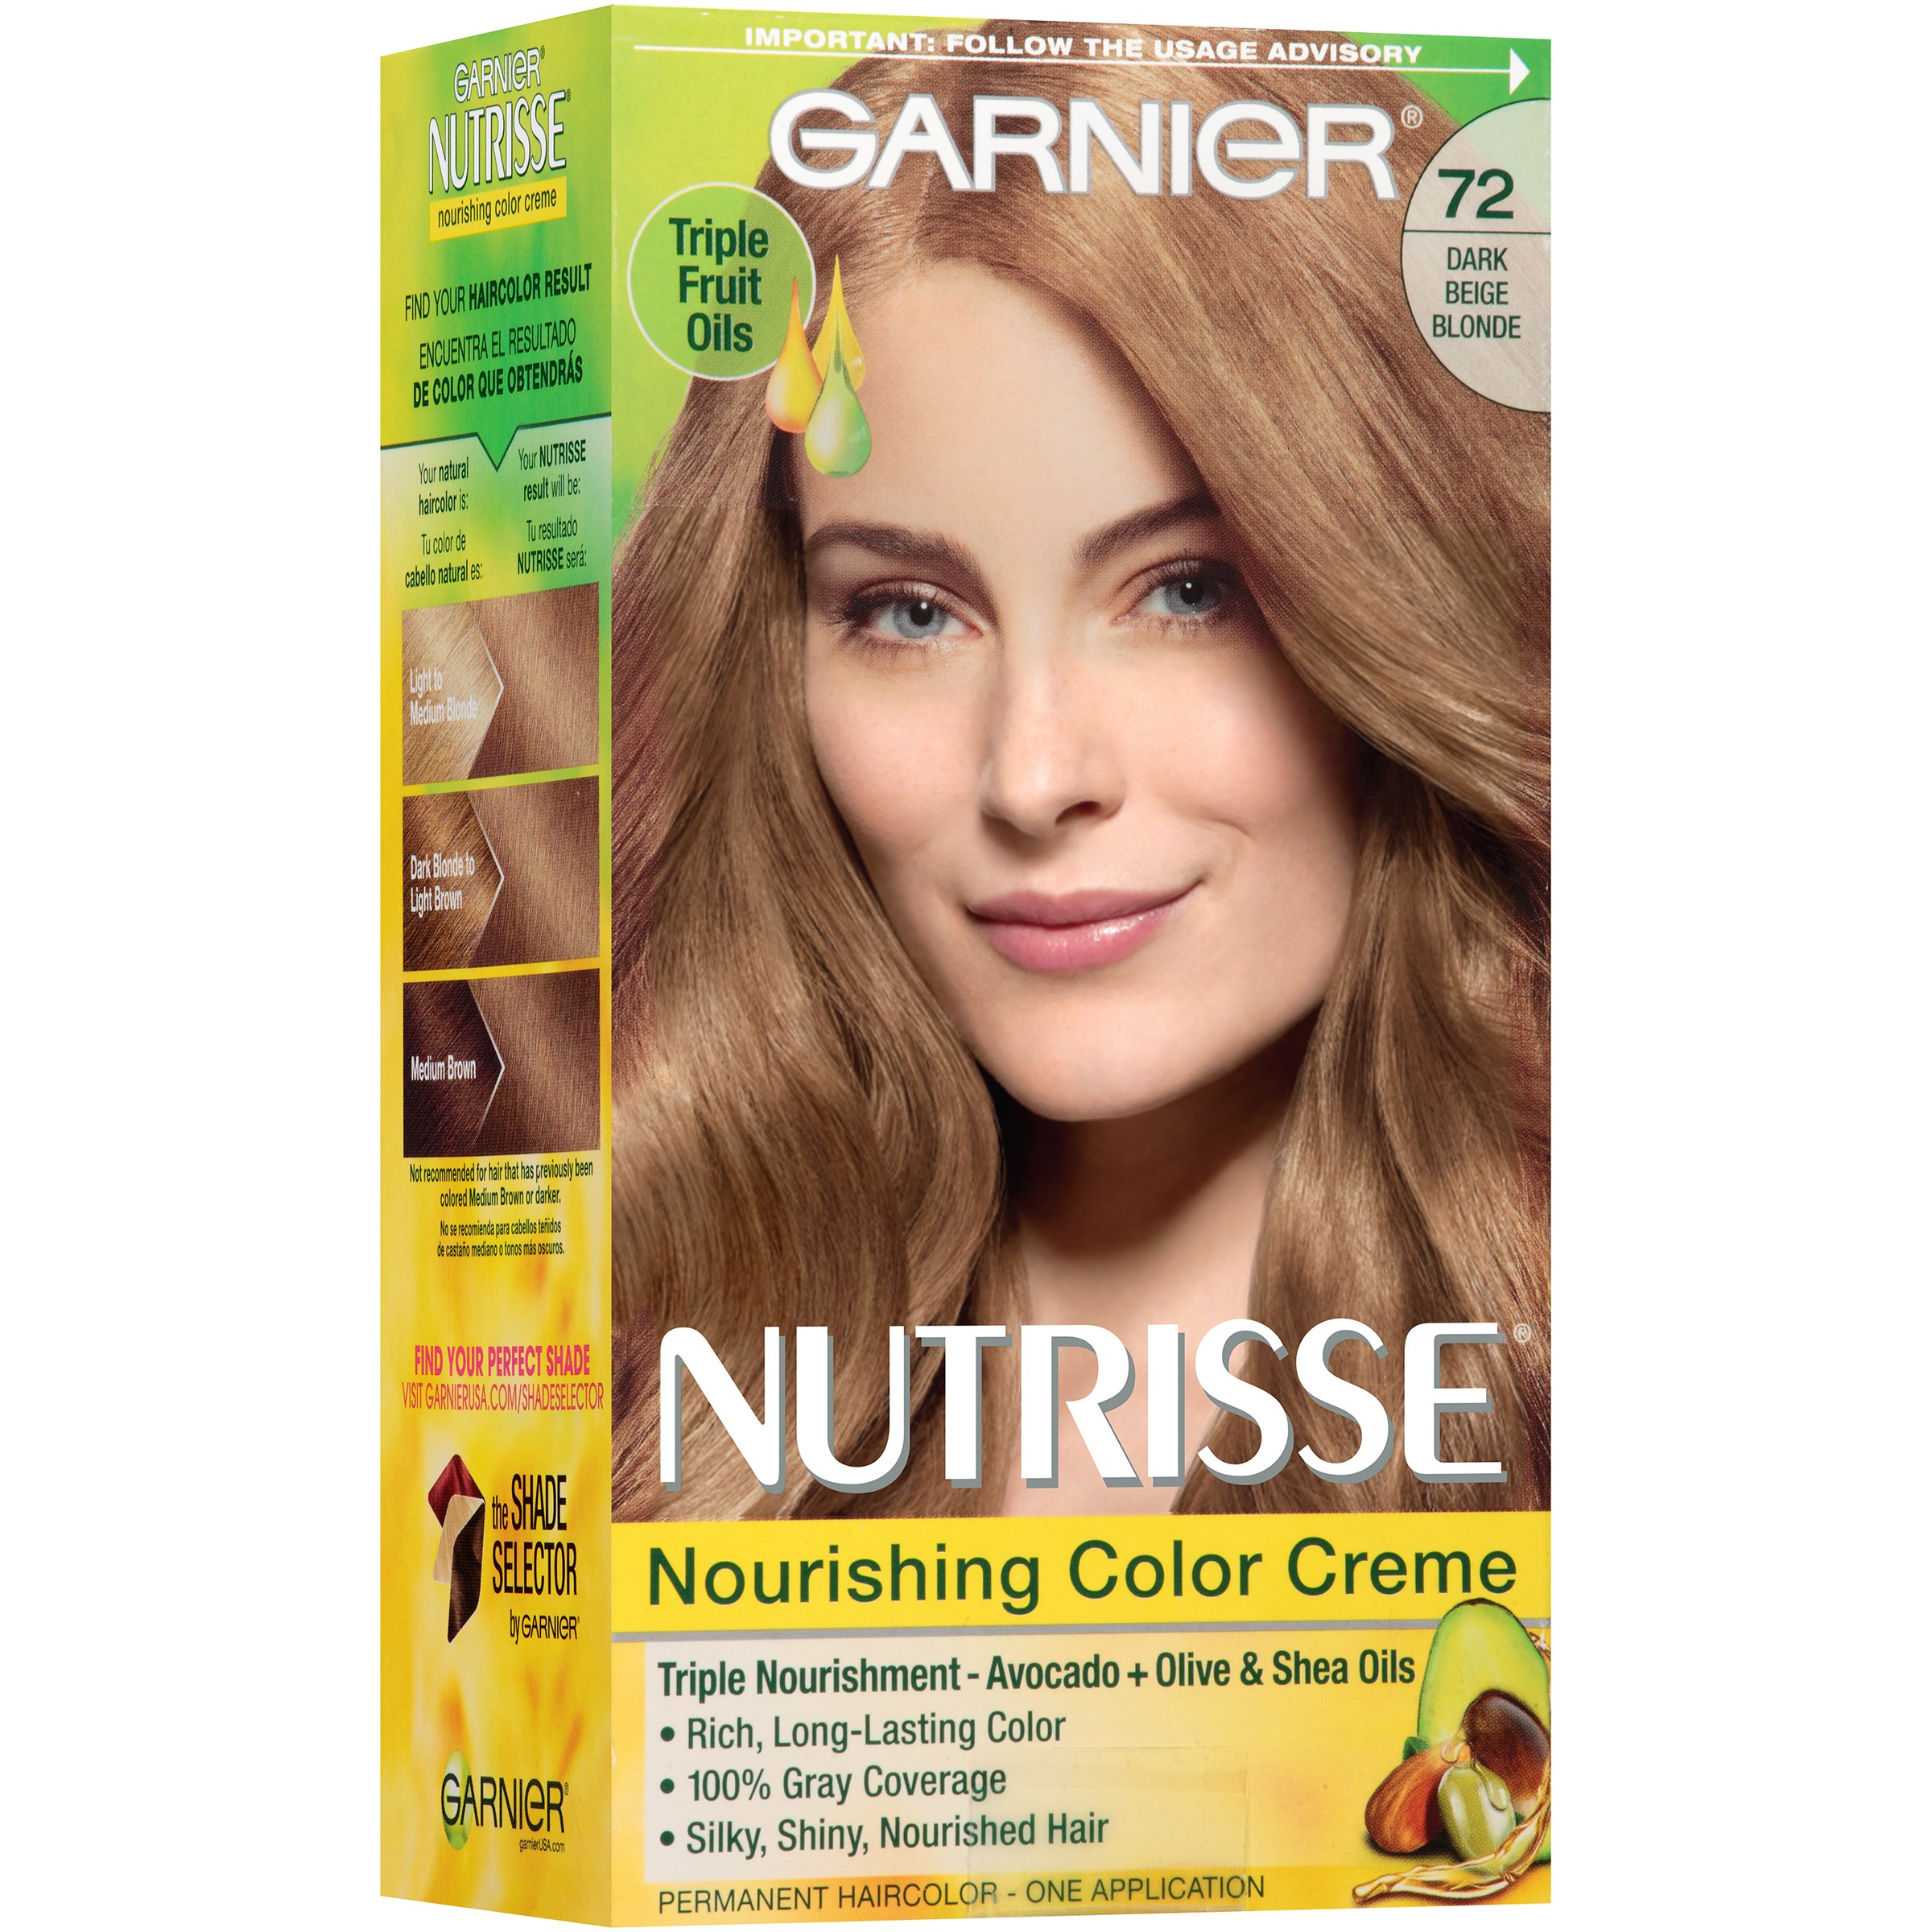 Garnier Nutrisse Nourishing Color Creme Hair Color 72